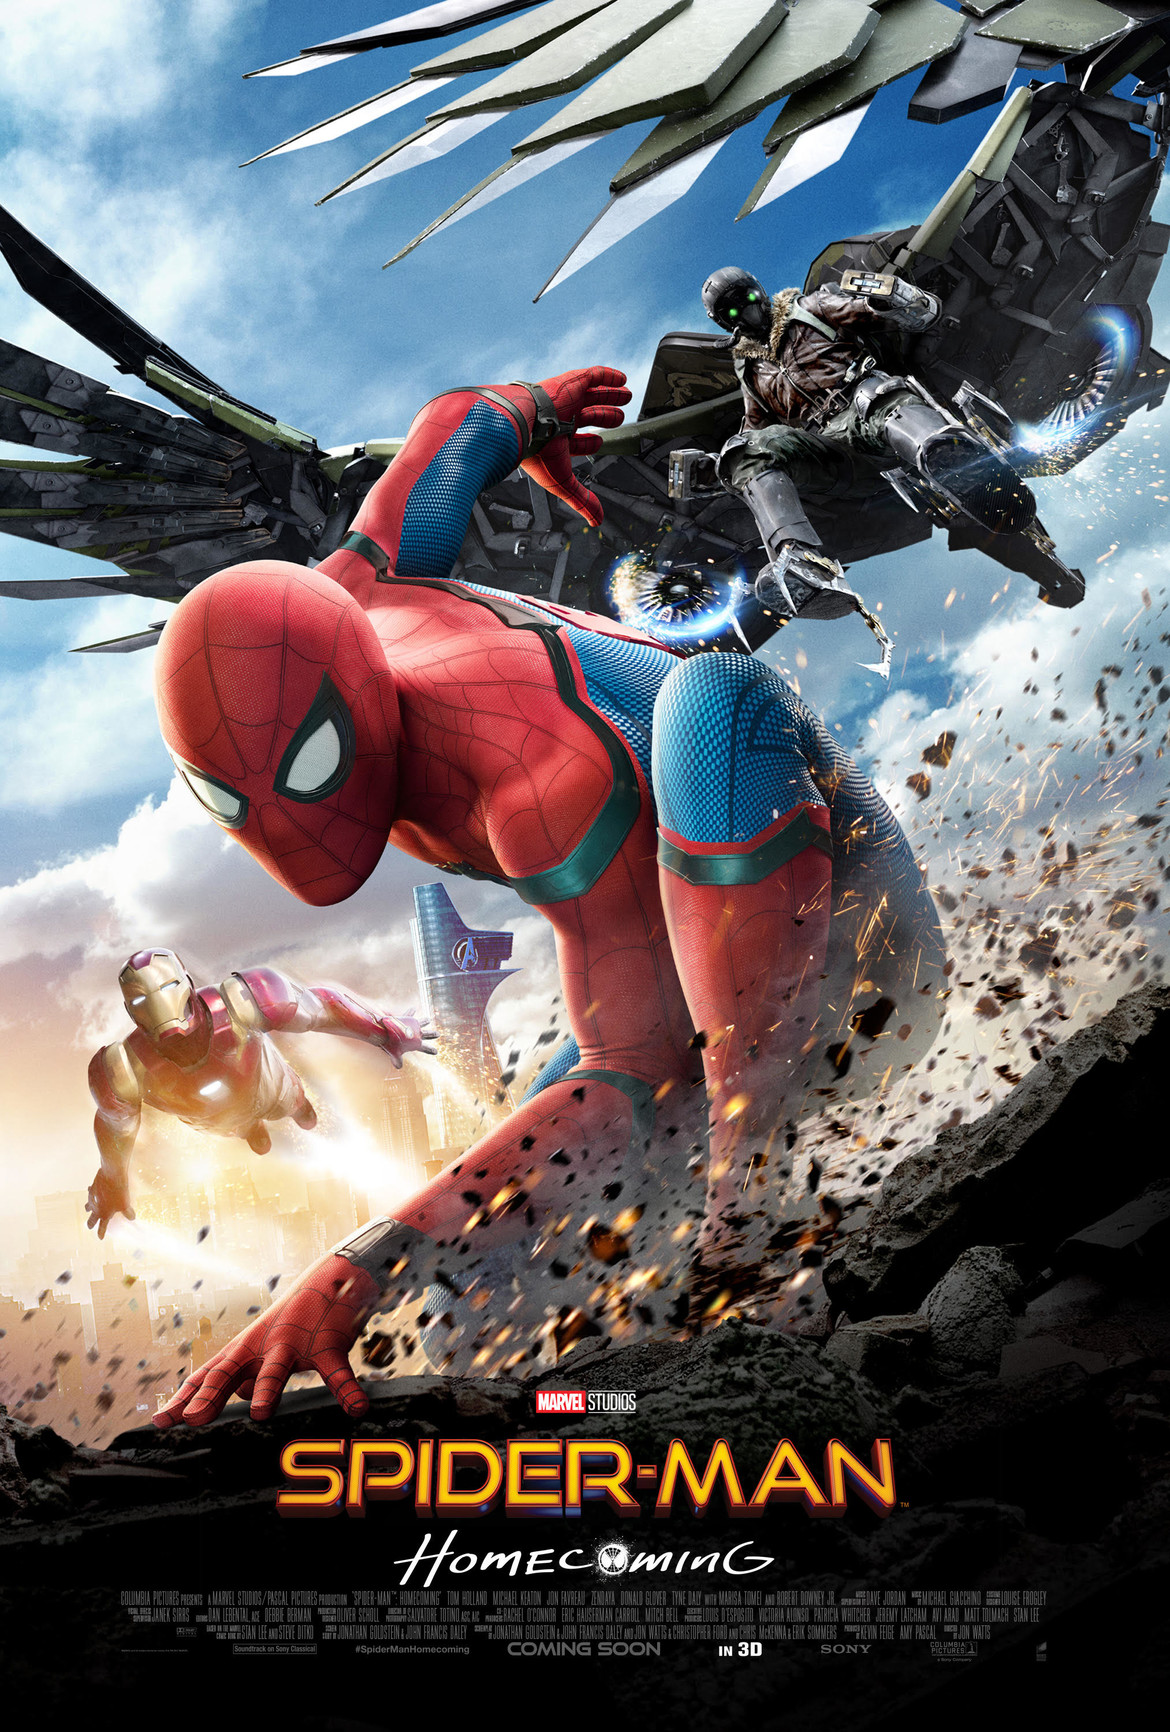 spider-man-2-homecoming-poster-2.jpg